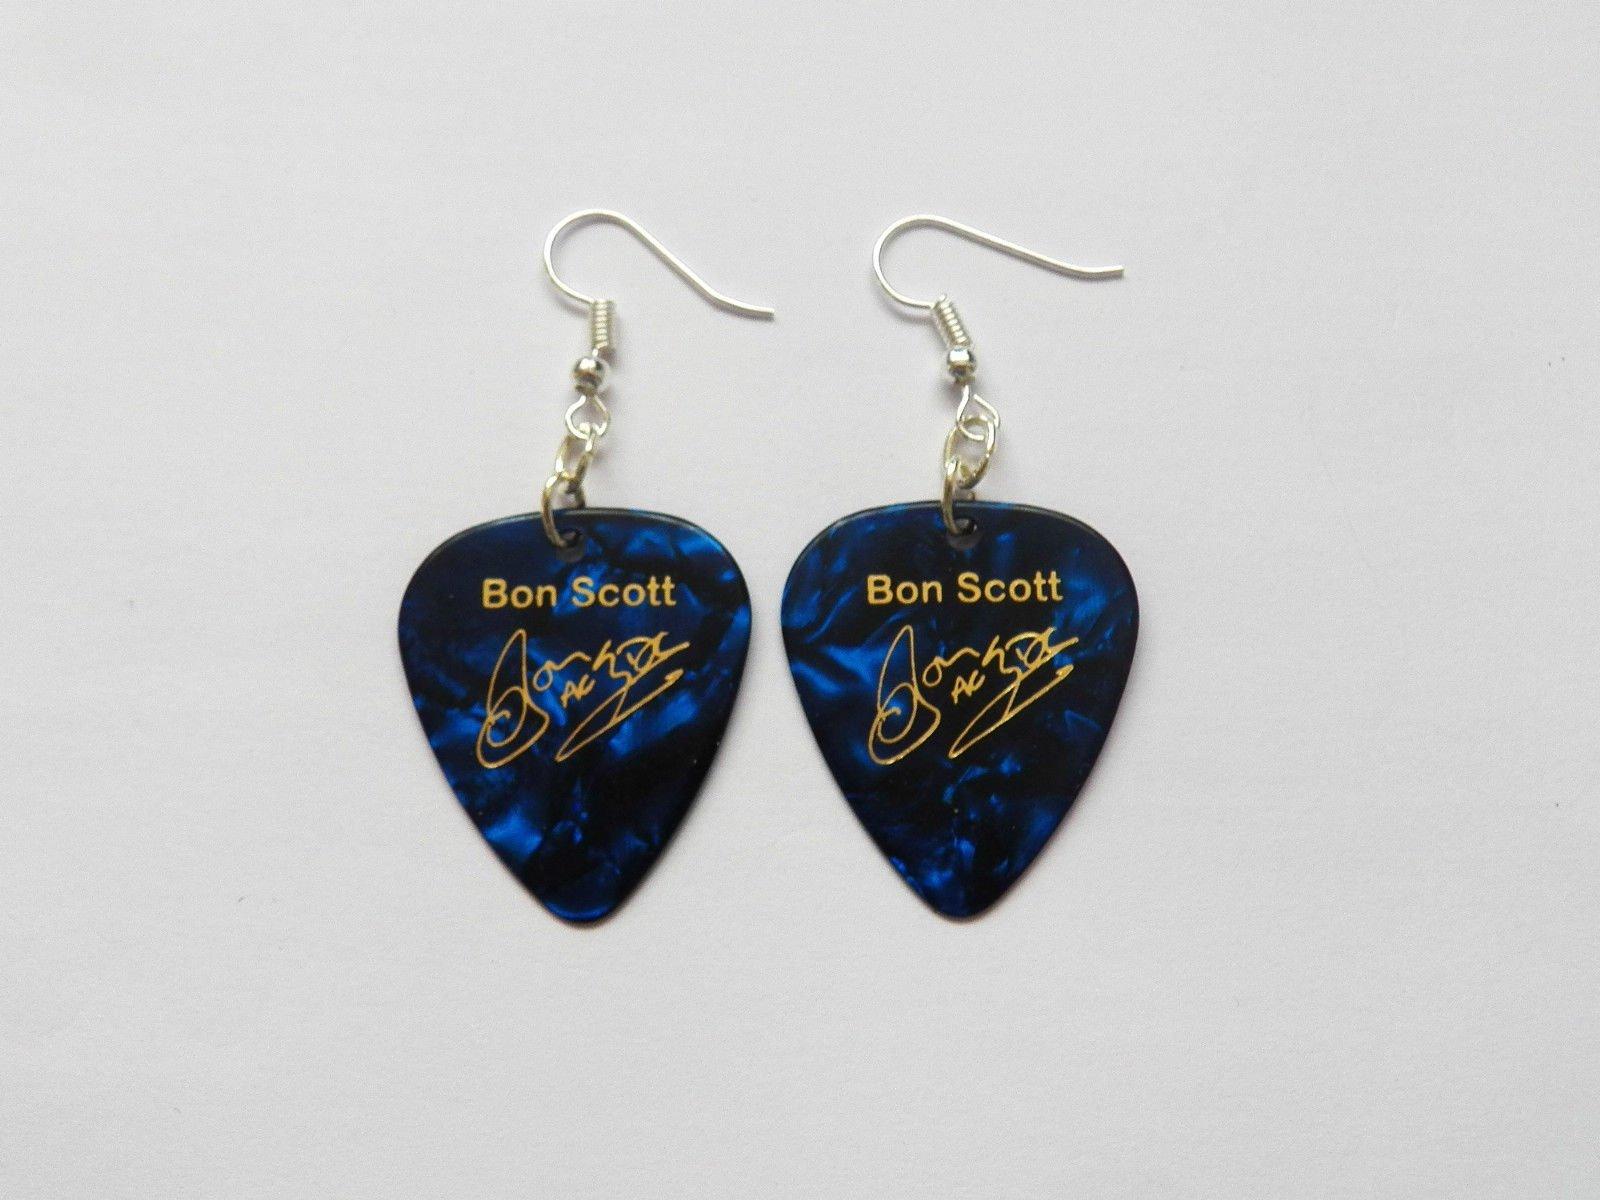 Bon Scott AC/DC ACDC Guitarra Púa Firma Oro Sello Pendientes: Amazon.es: Instrumentos musicales